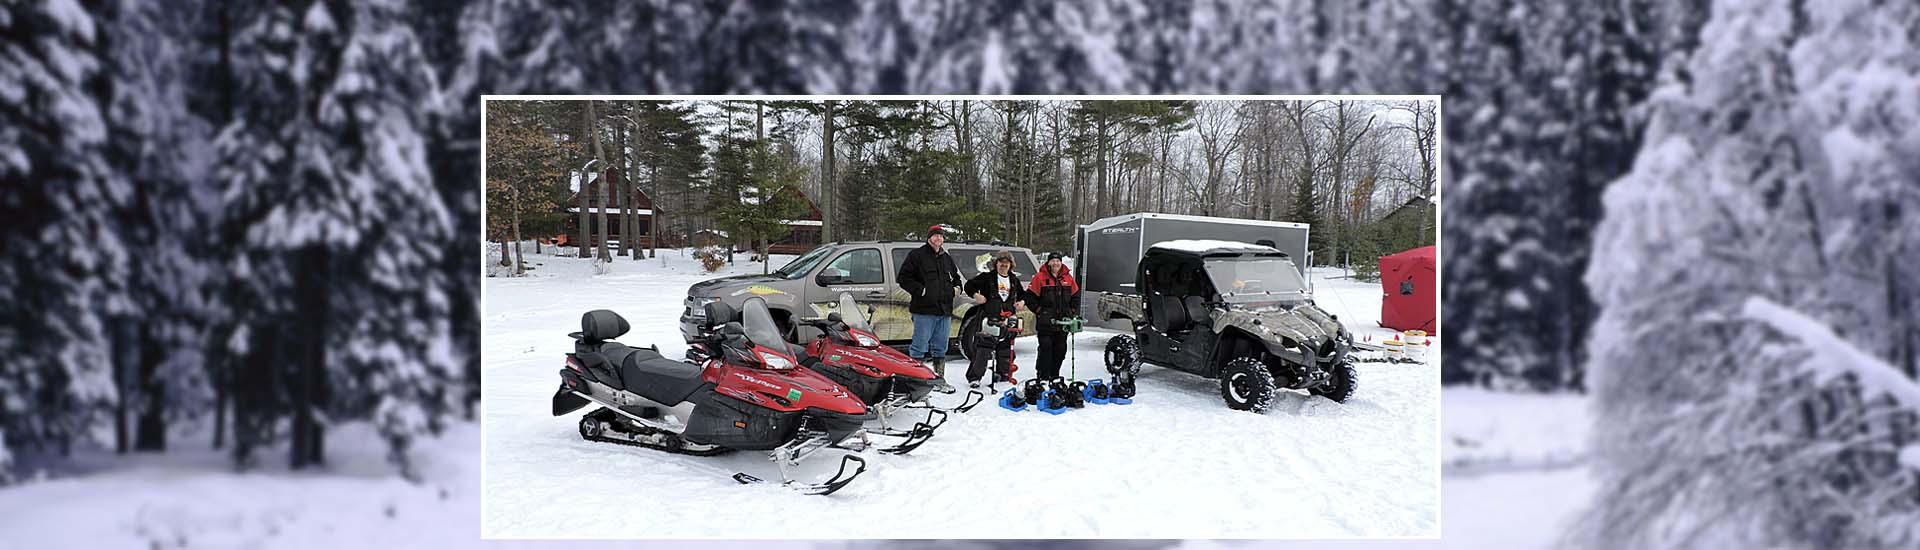 Hayward wi cabin rentals wisconsin cabin rentals cabins for Wisconsin ice fishing resorts